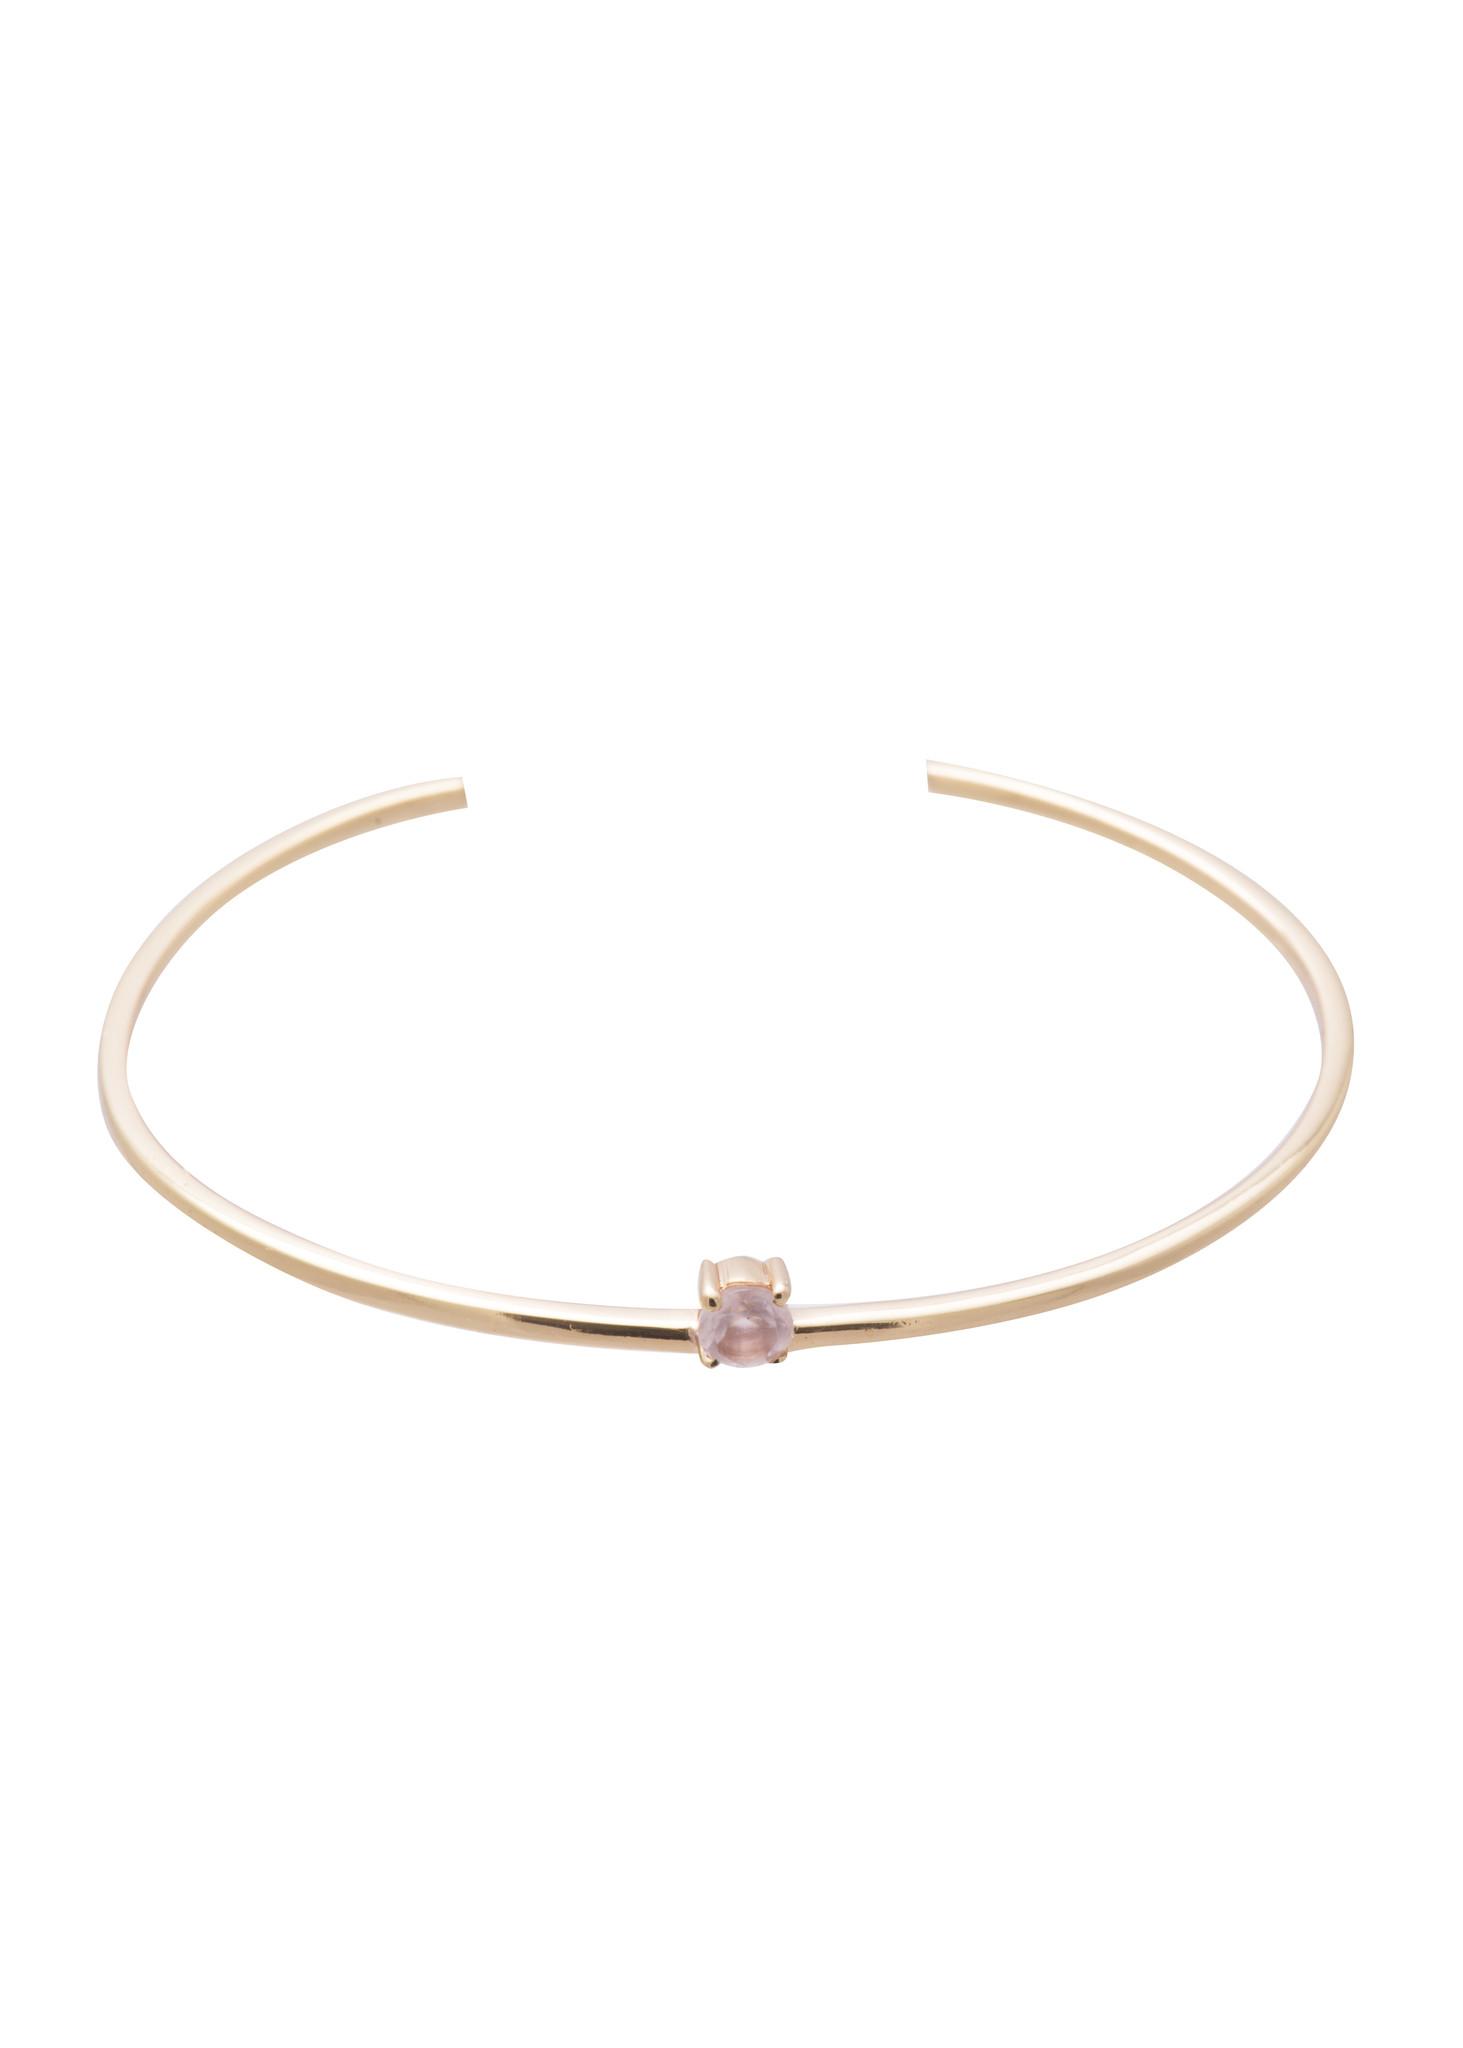 Sarah Mulder Jewelry Obsession Cuff